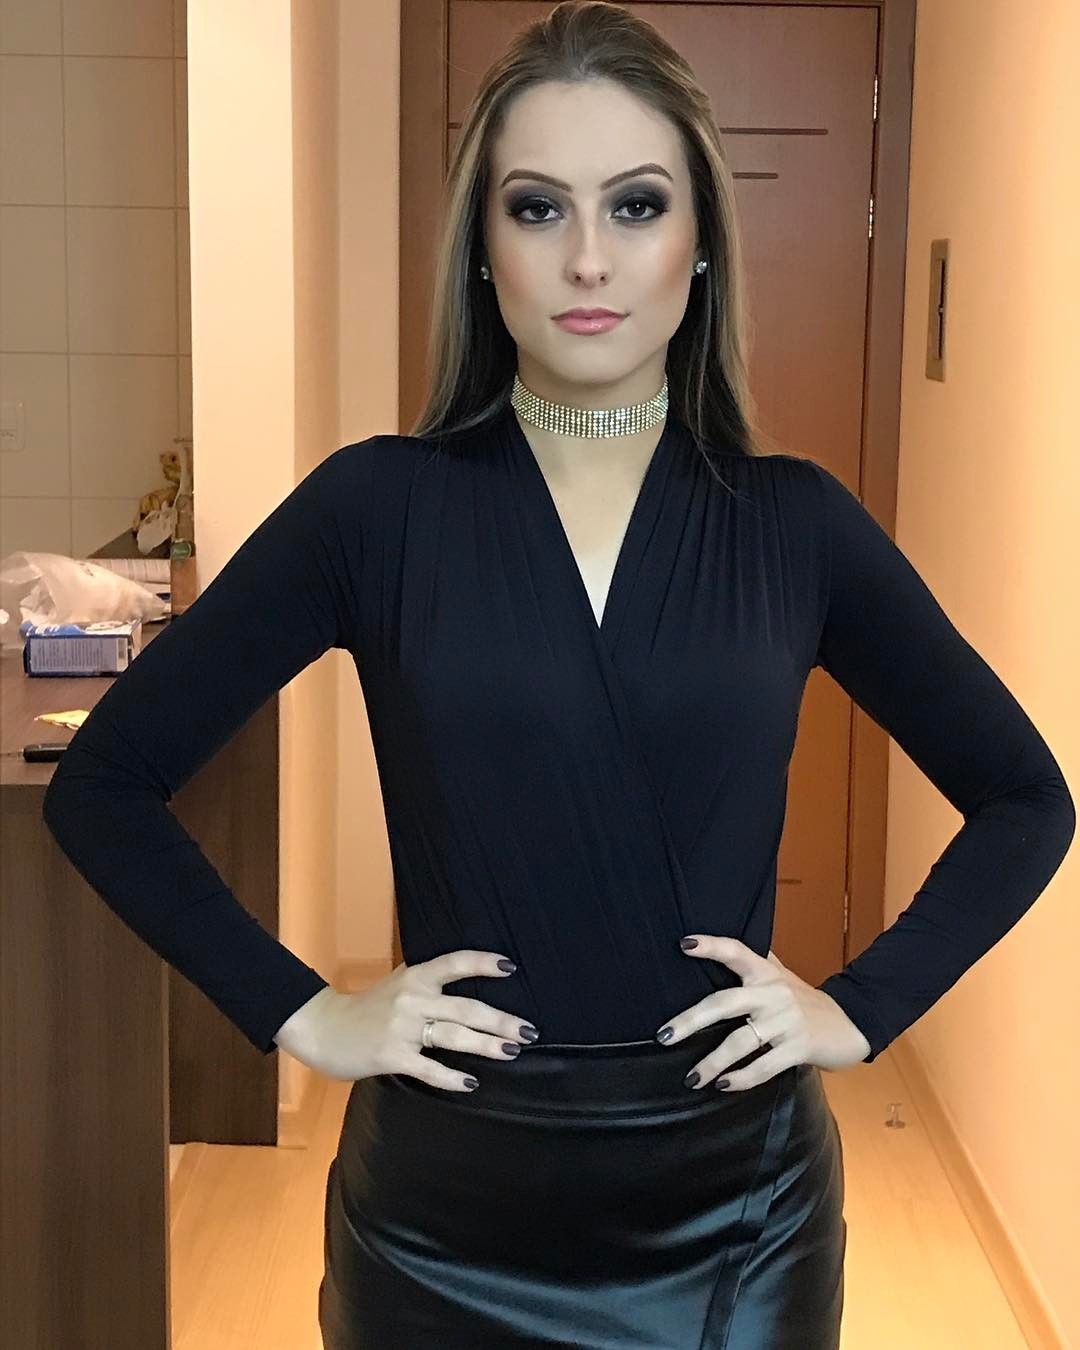 cristine boff sartor, segunda finalista de miss latinoamerica 2019. 18443310